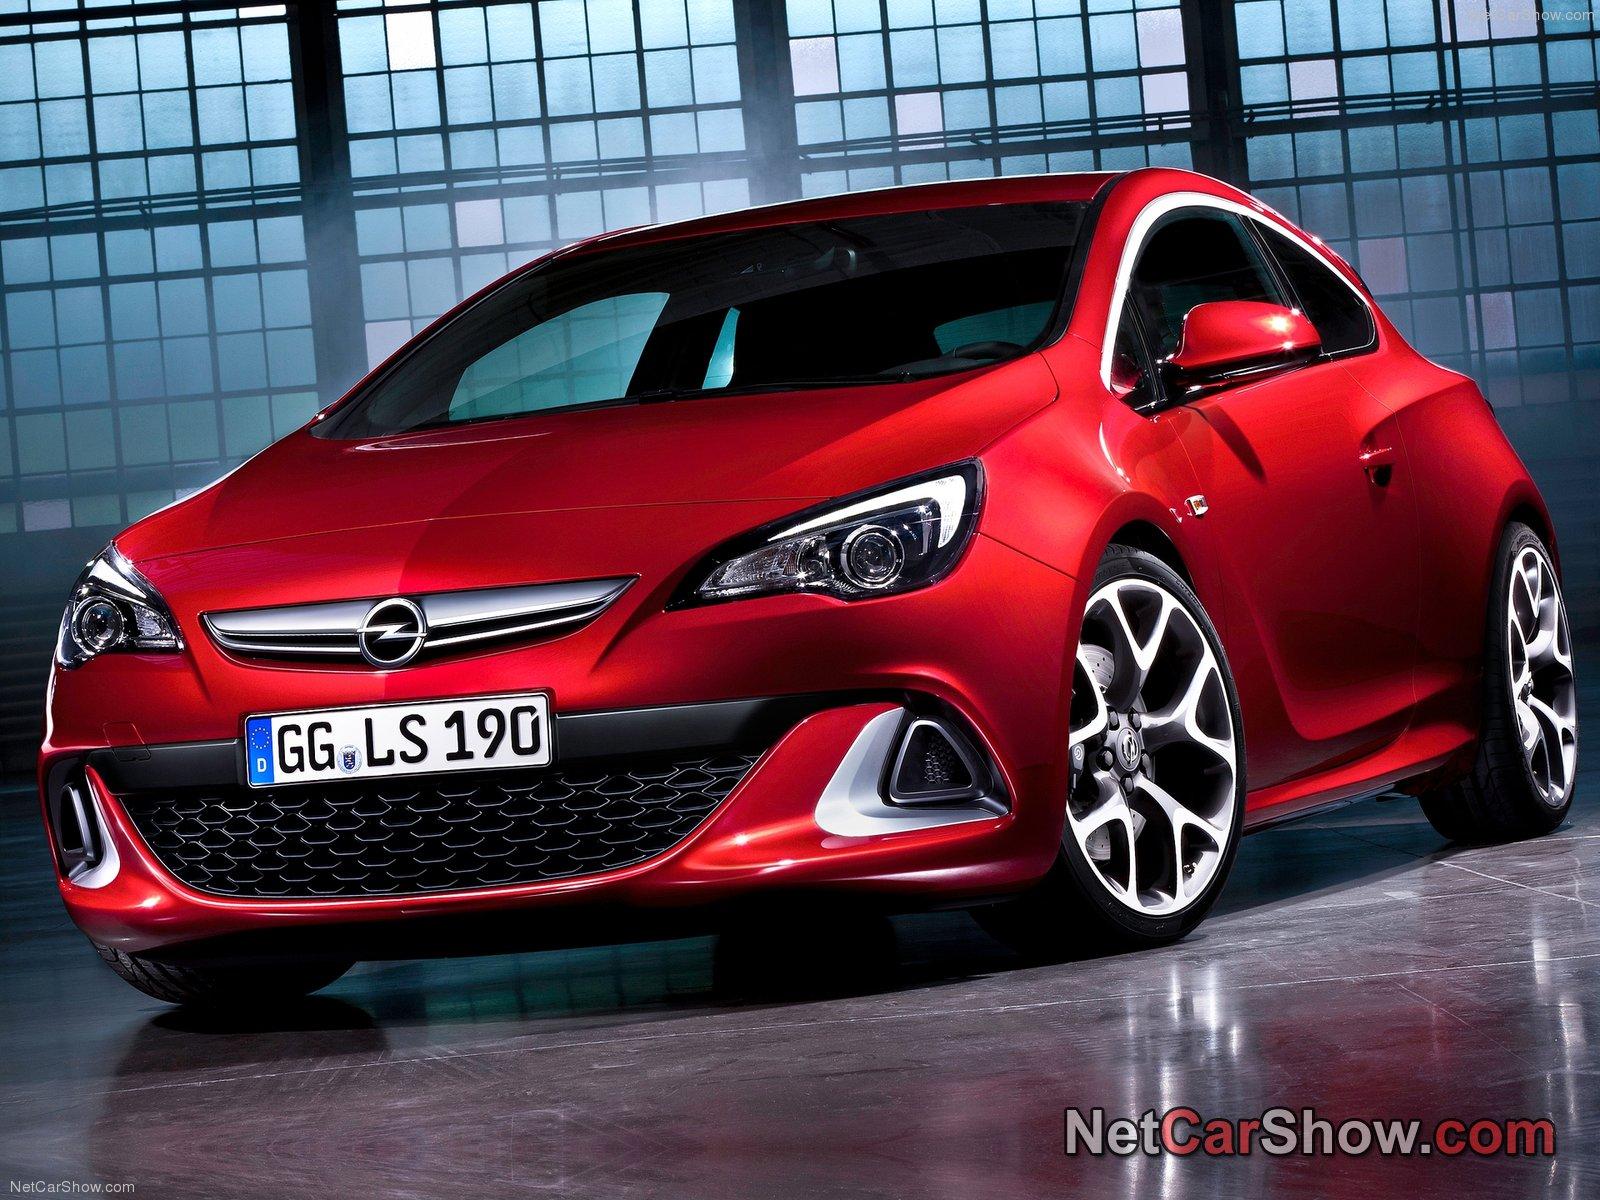 Opel Astra GTC 2.0 Turbo OPC